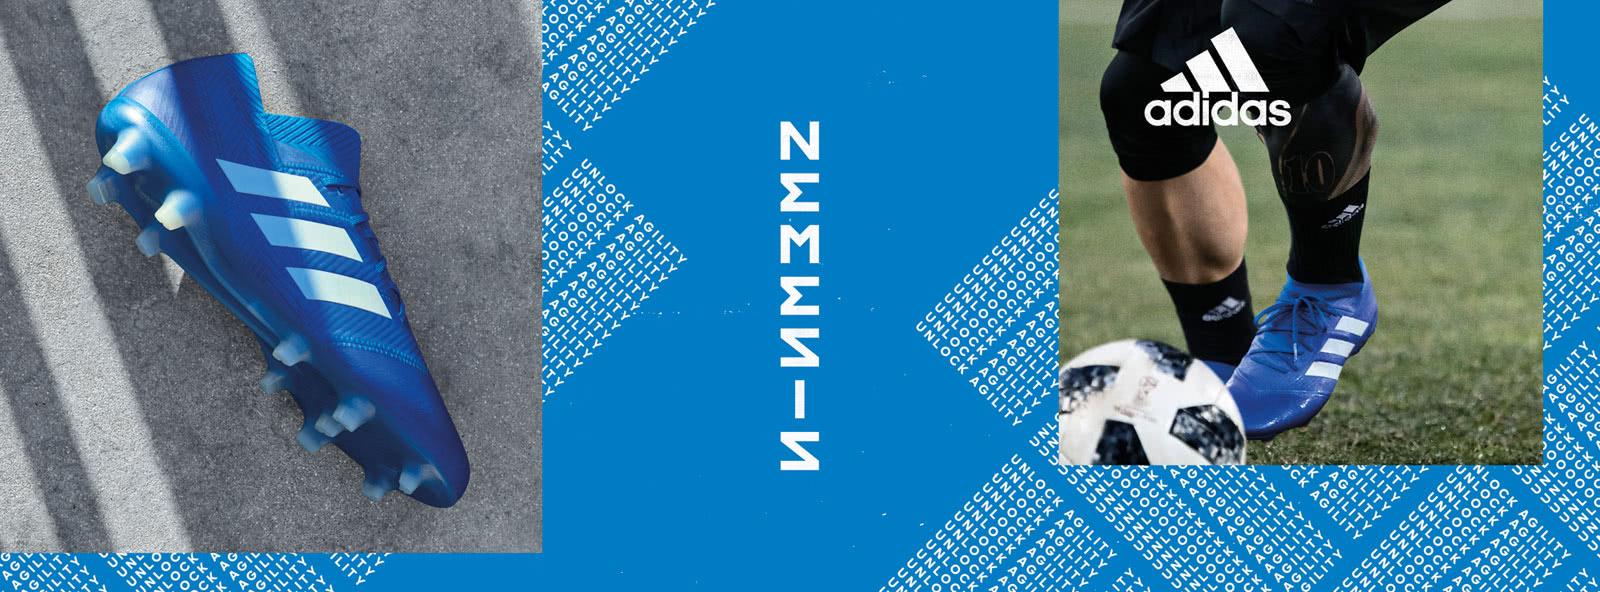 Komplett neue die Adidas Nemeziz 18